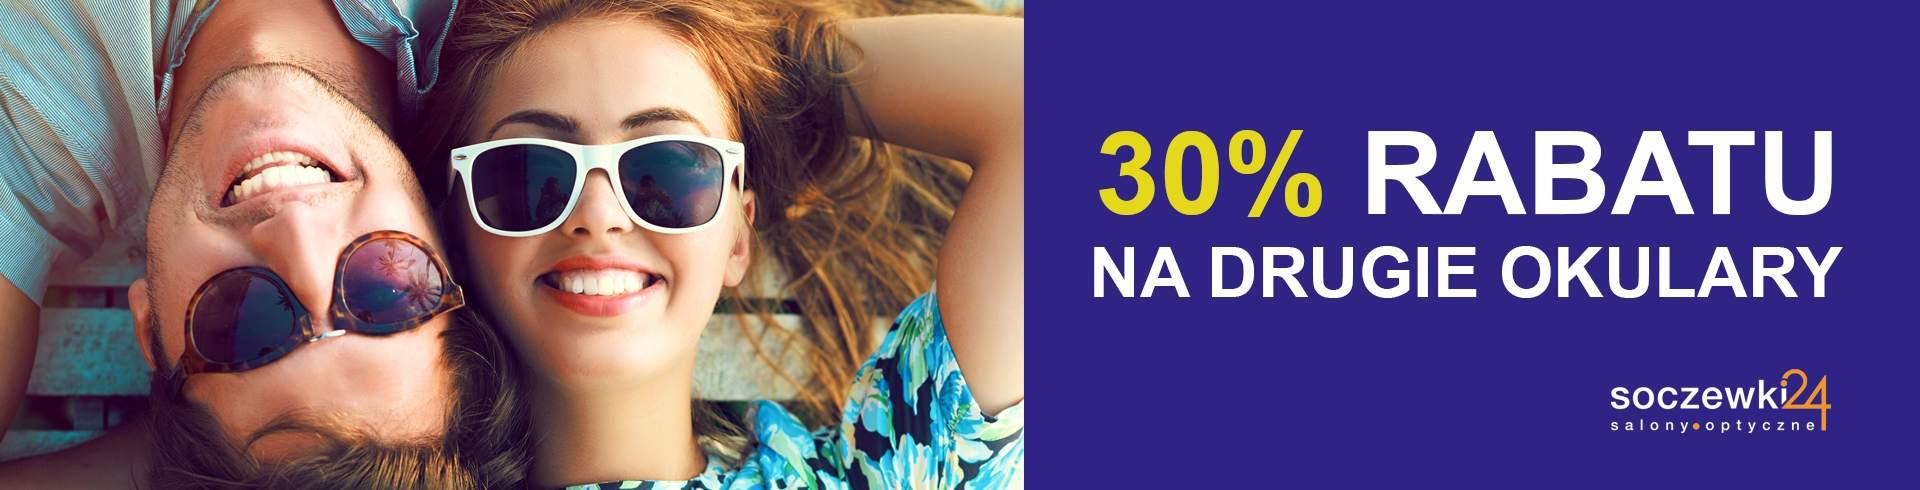 Soczewki24: 30% rabatu na drugie okulary